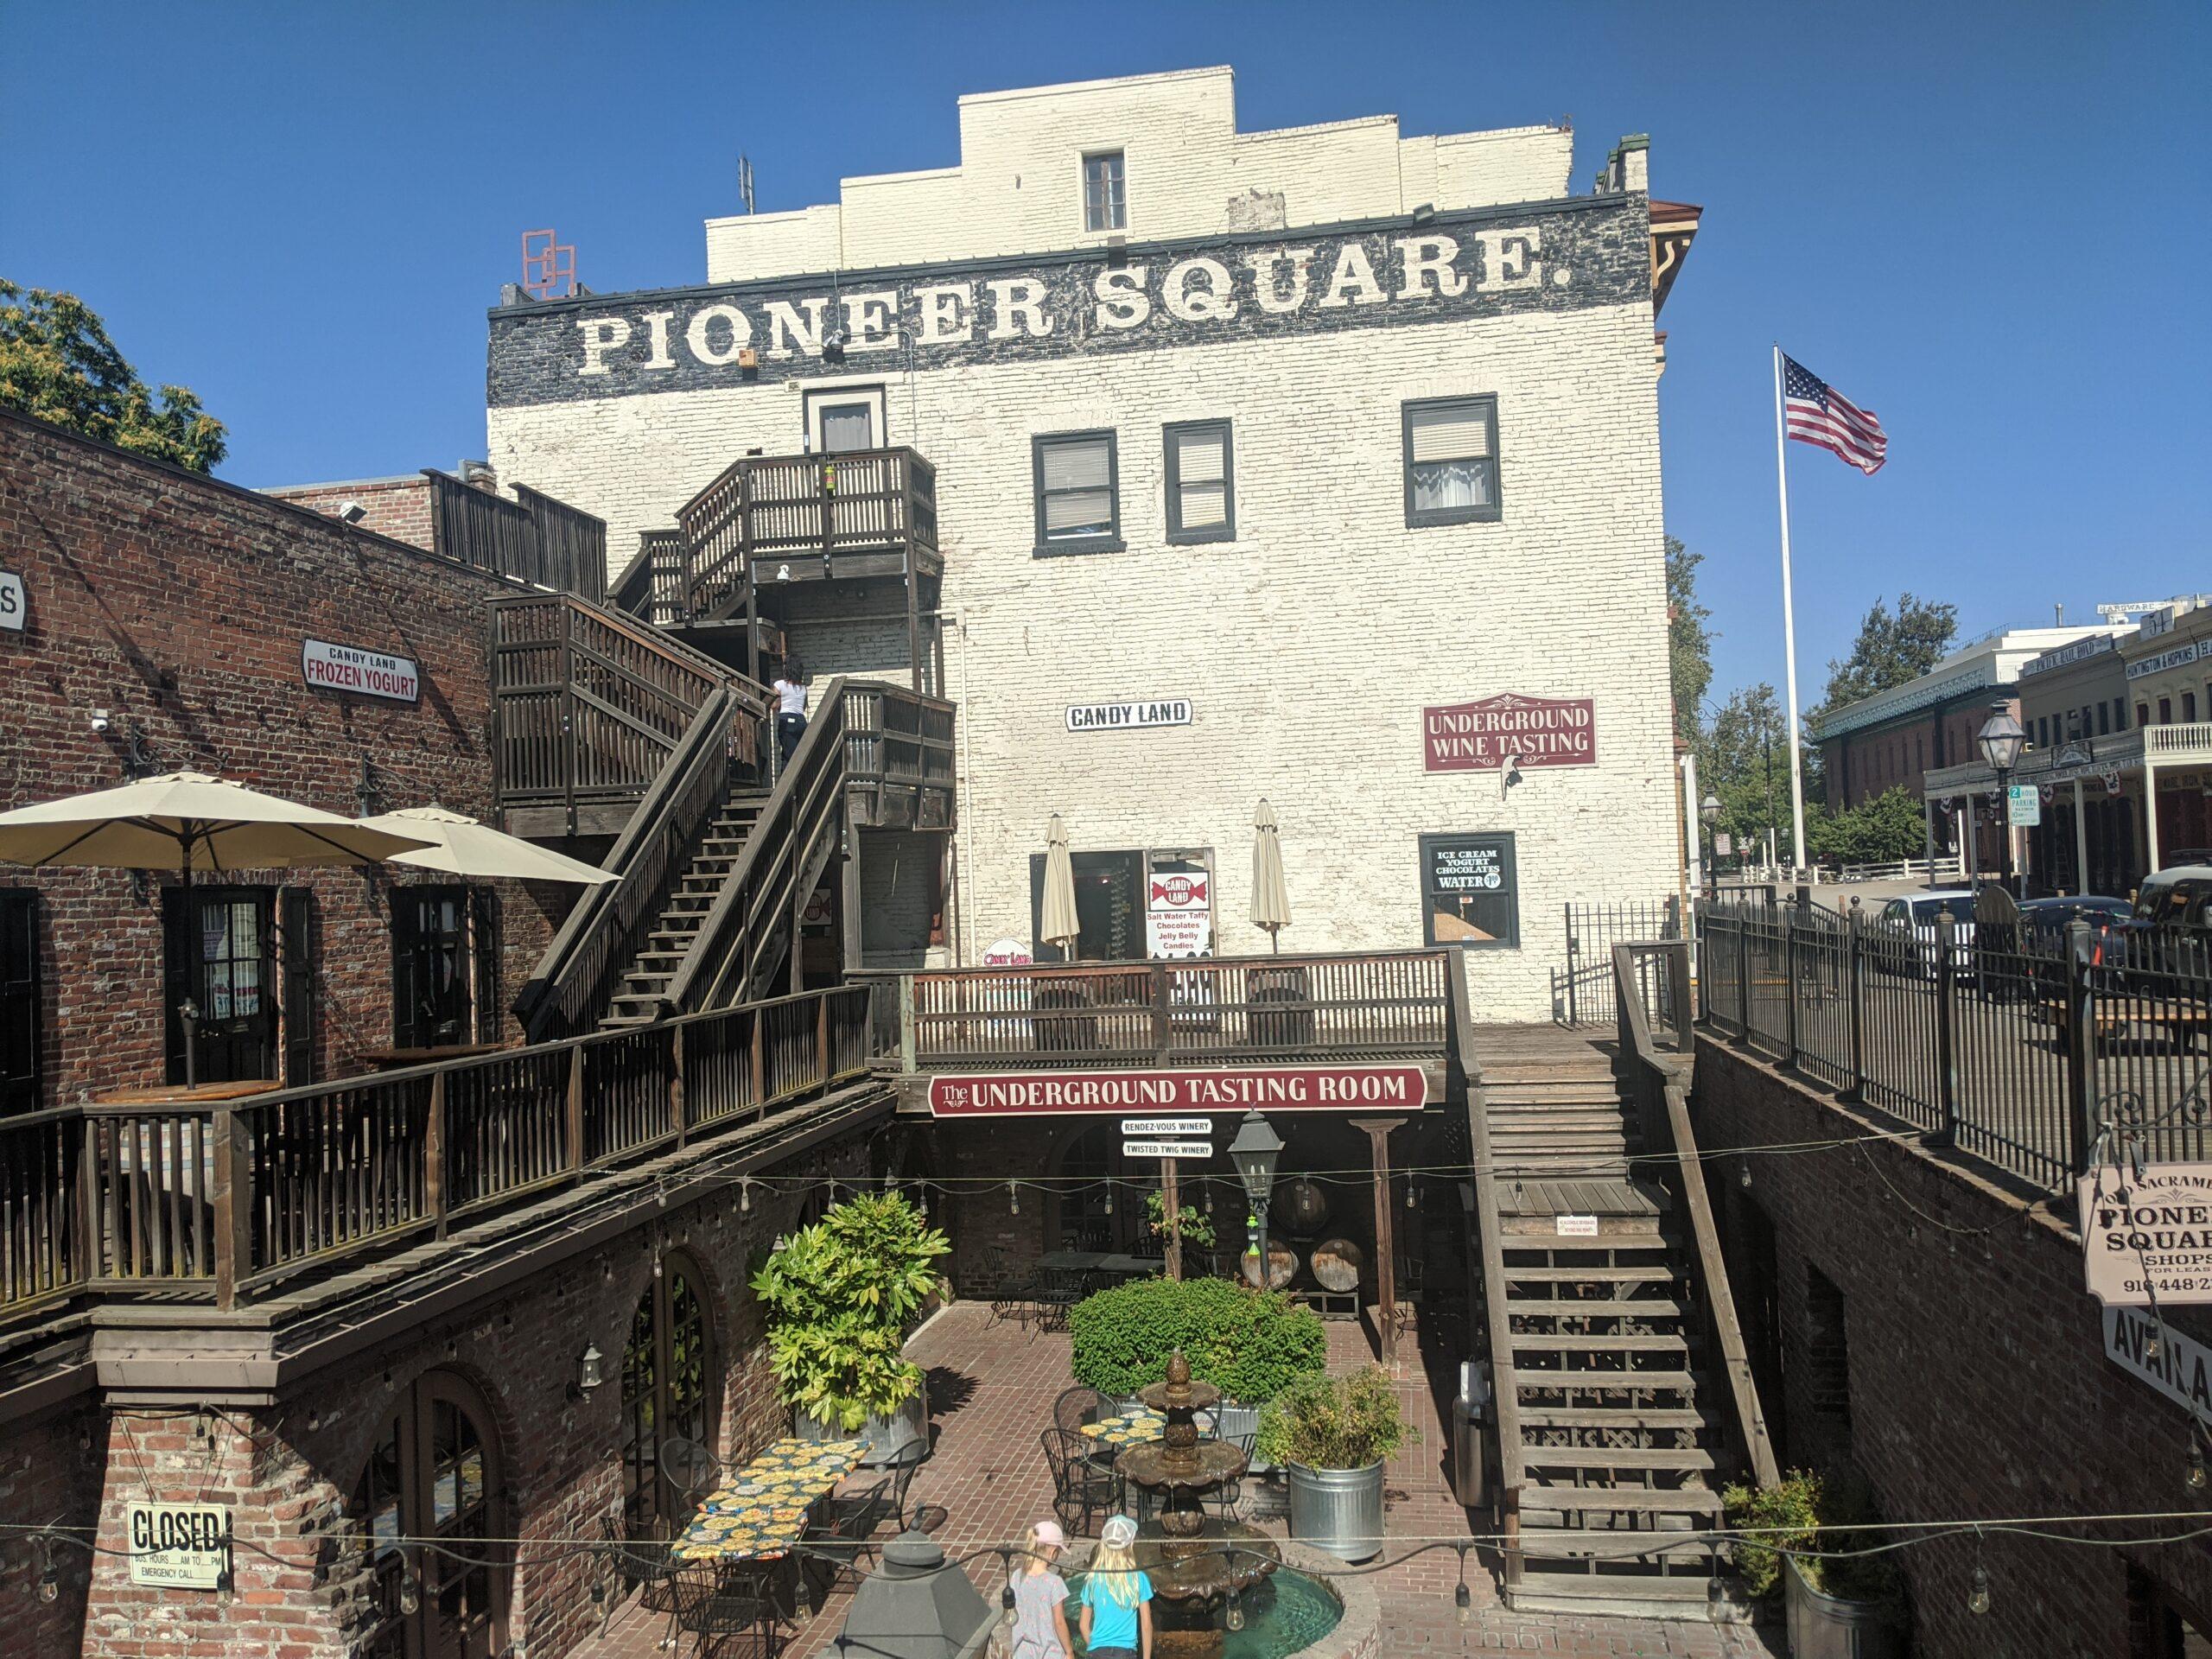 Pioneer Square in Old Sacramento